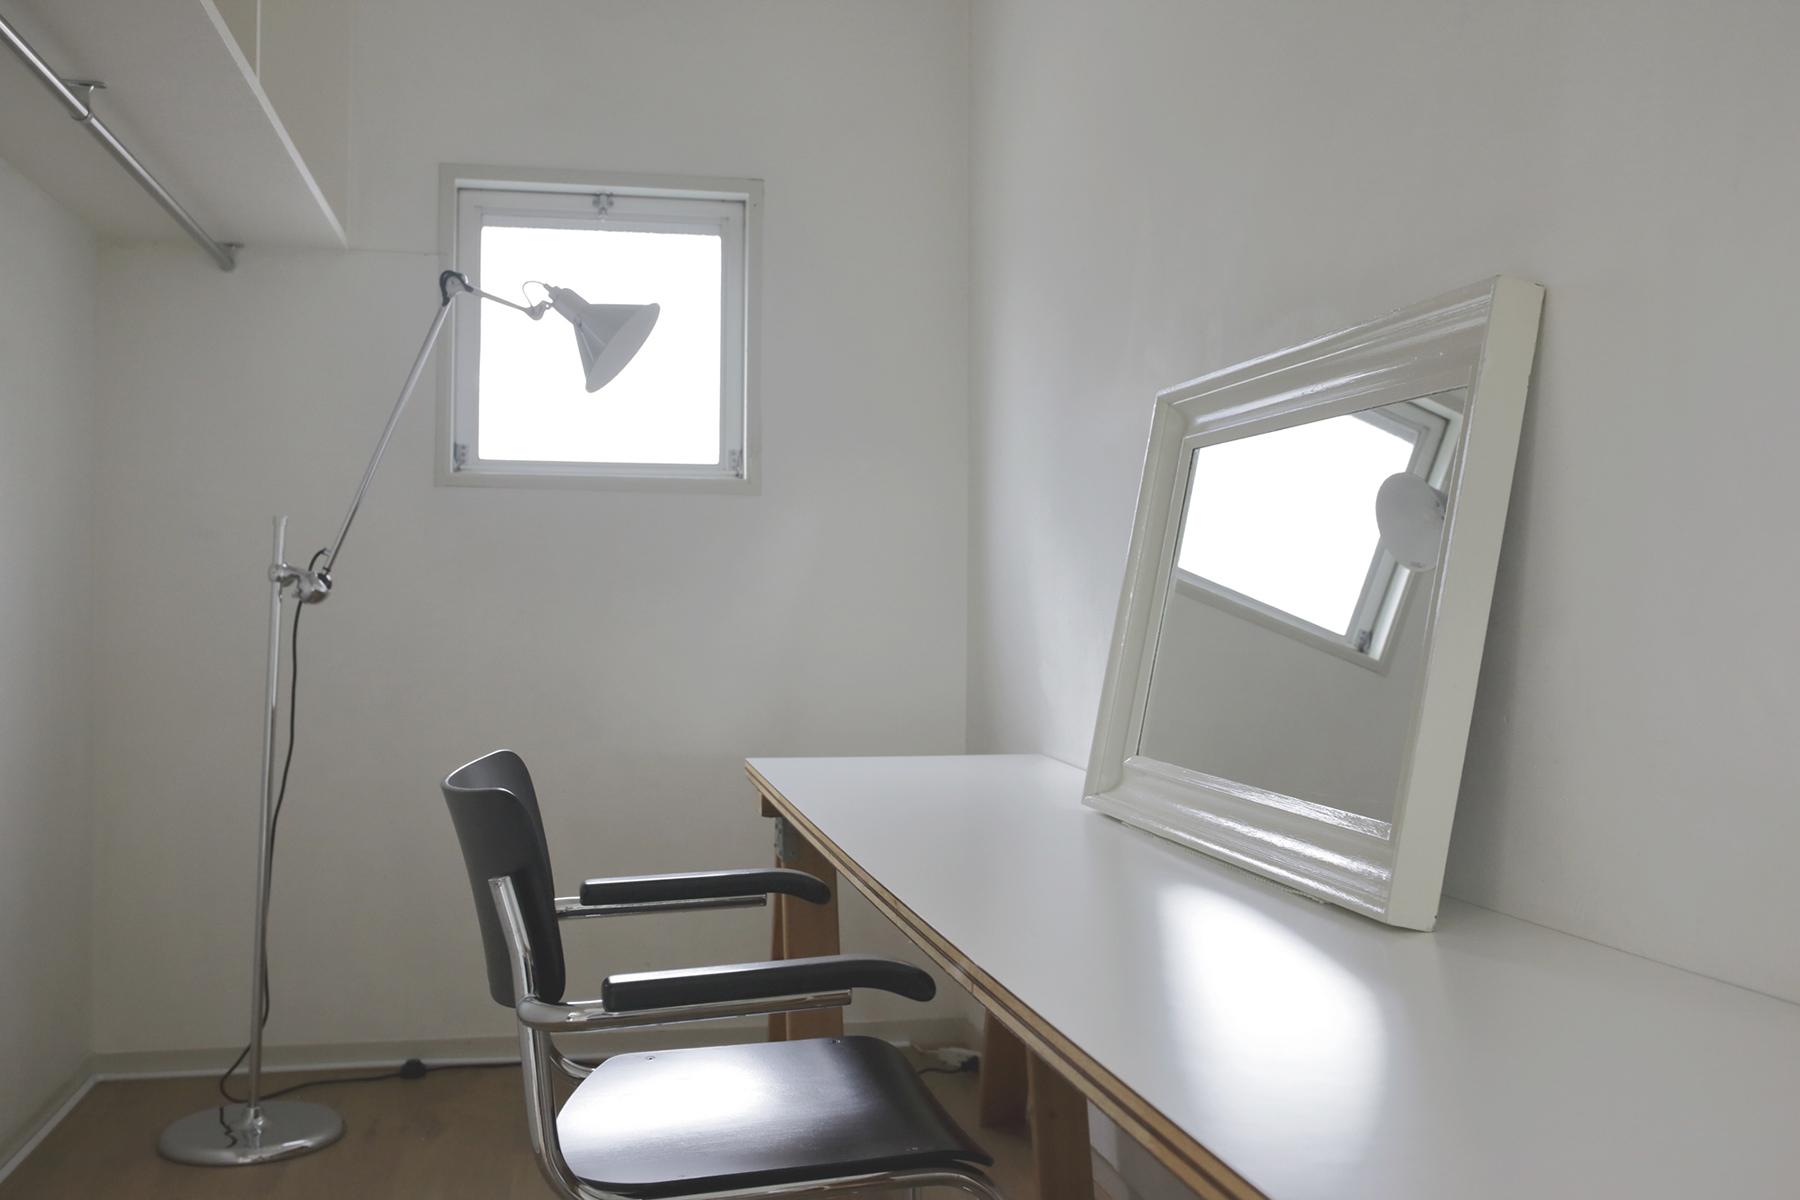 SHILO STUDIO GOTENYAMA (シロスタジオ ゴテンヤマ)